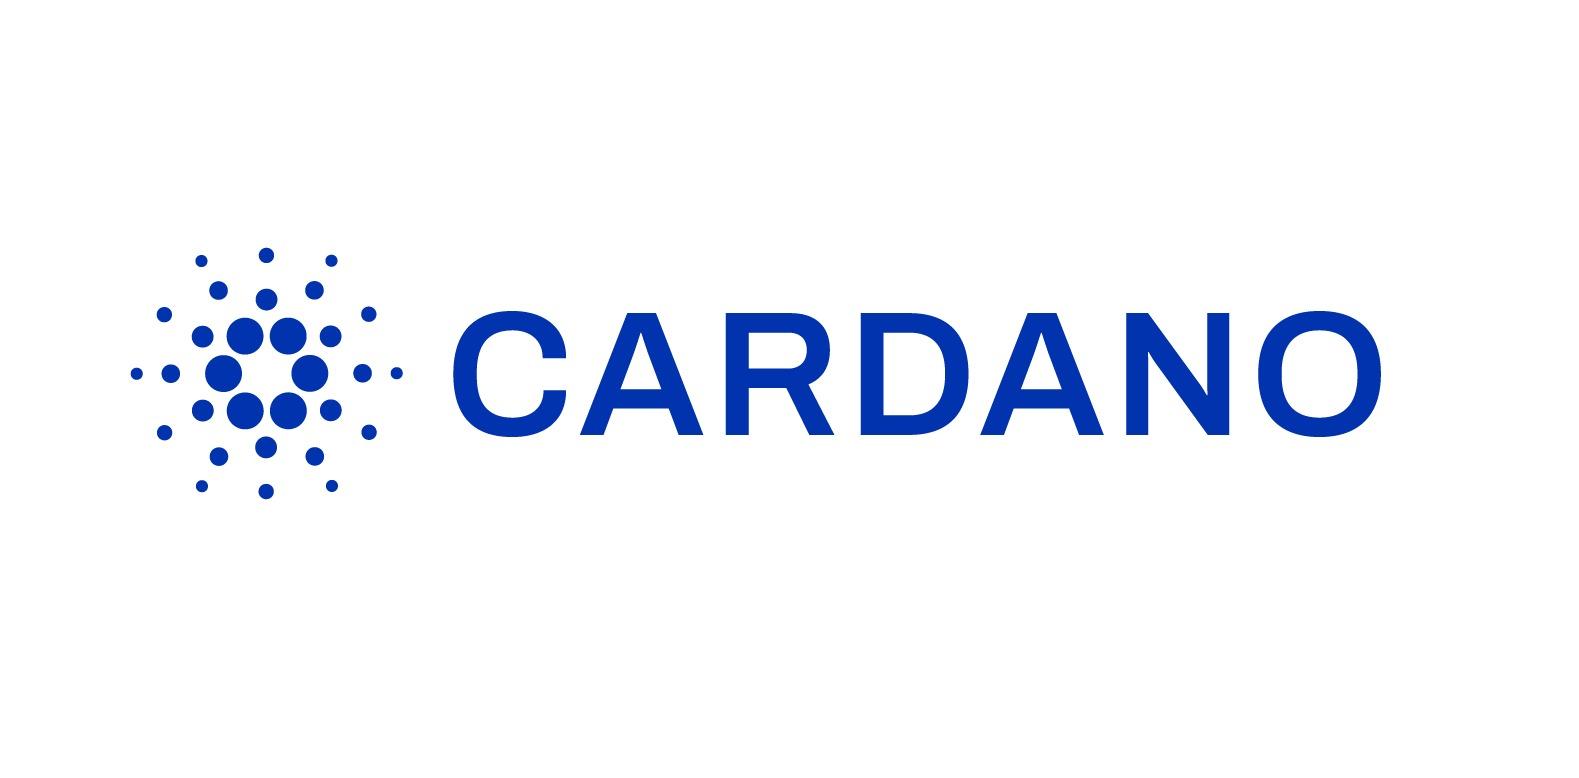 Cardano koers